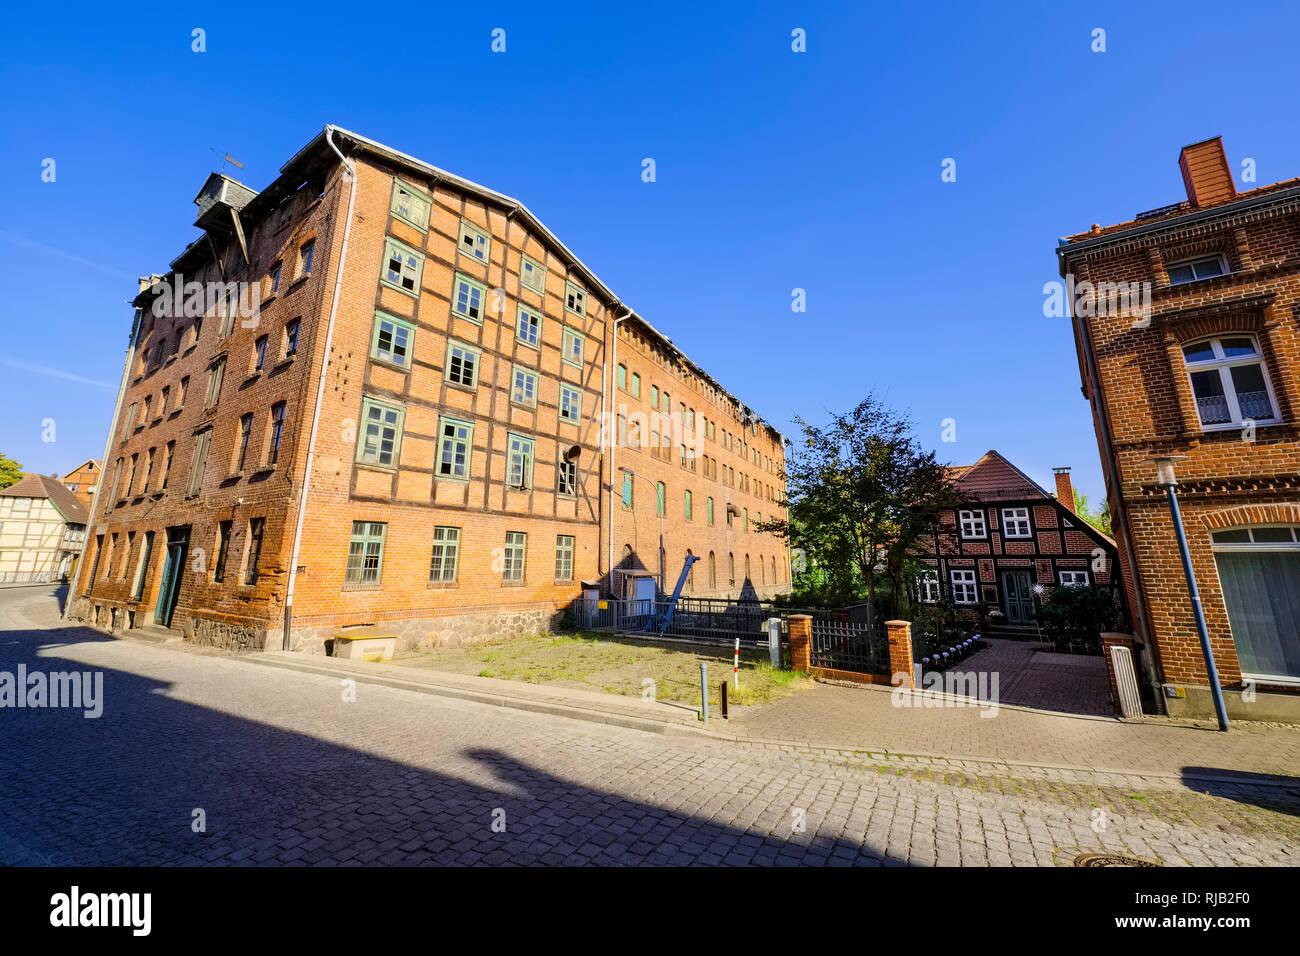 Bolbrueggesche Muehle - historic mill, Grabow (Elde), Mecklenburg-West Pomerania, Germany - Stock Image